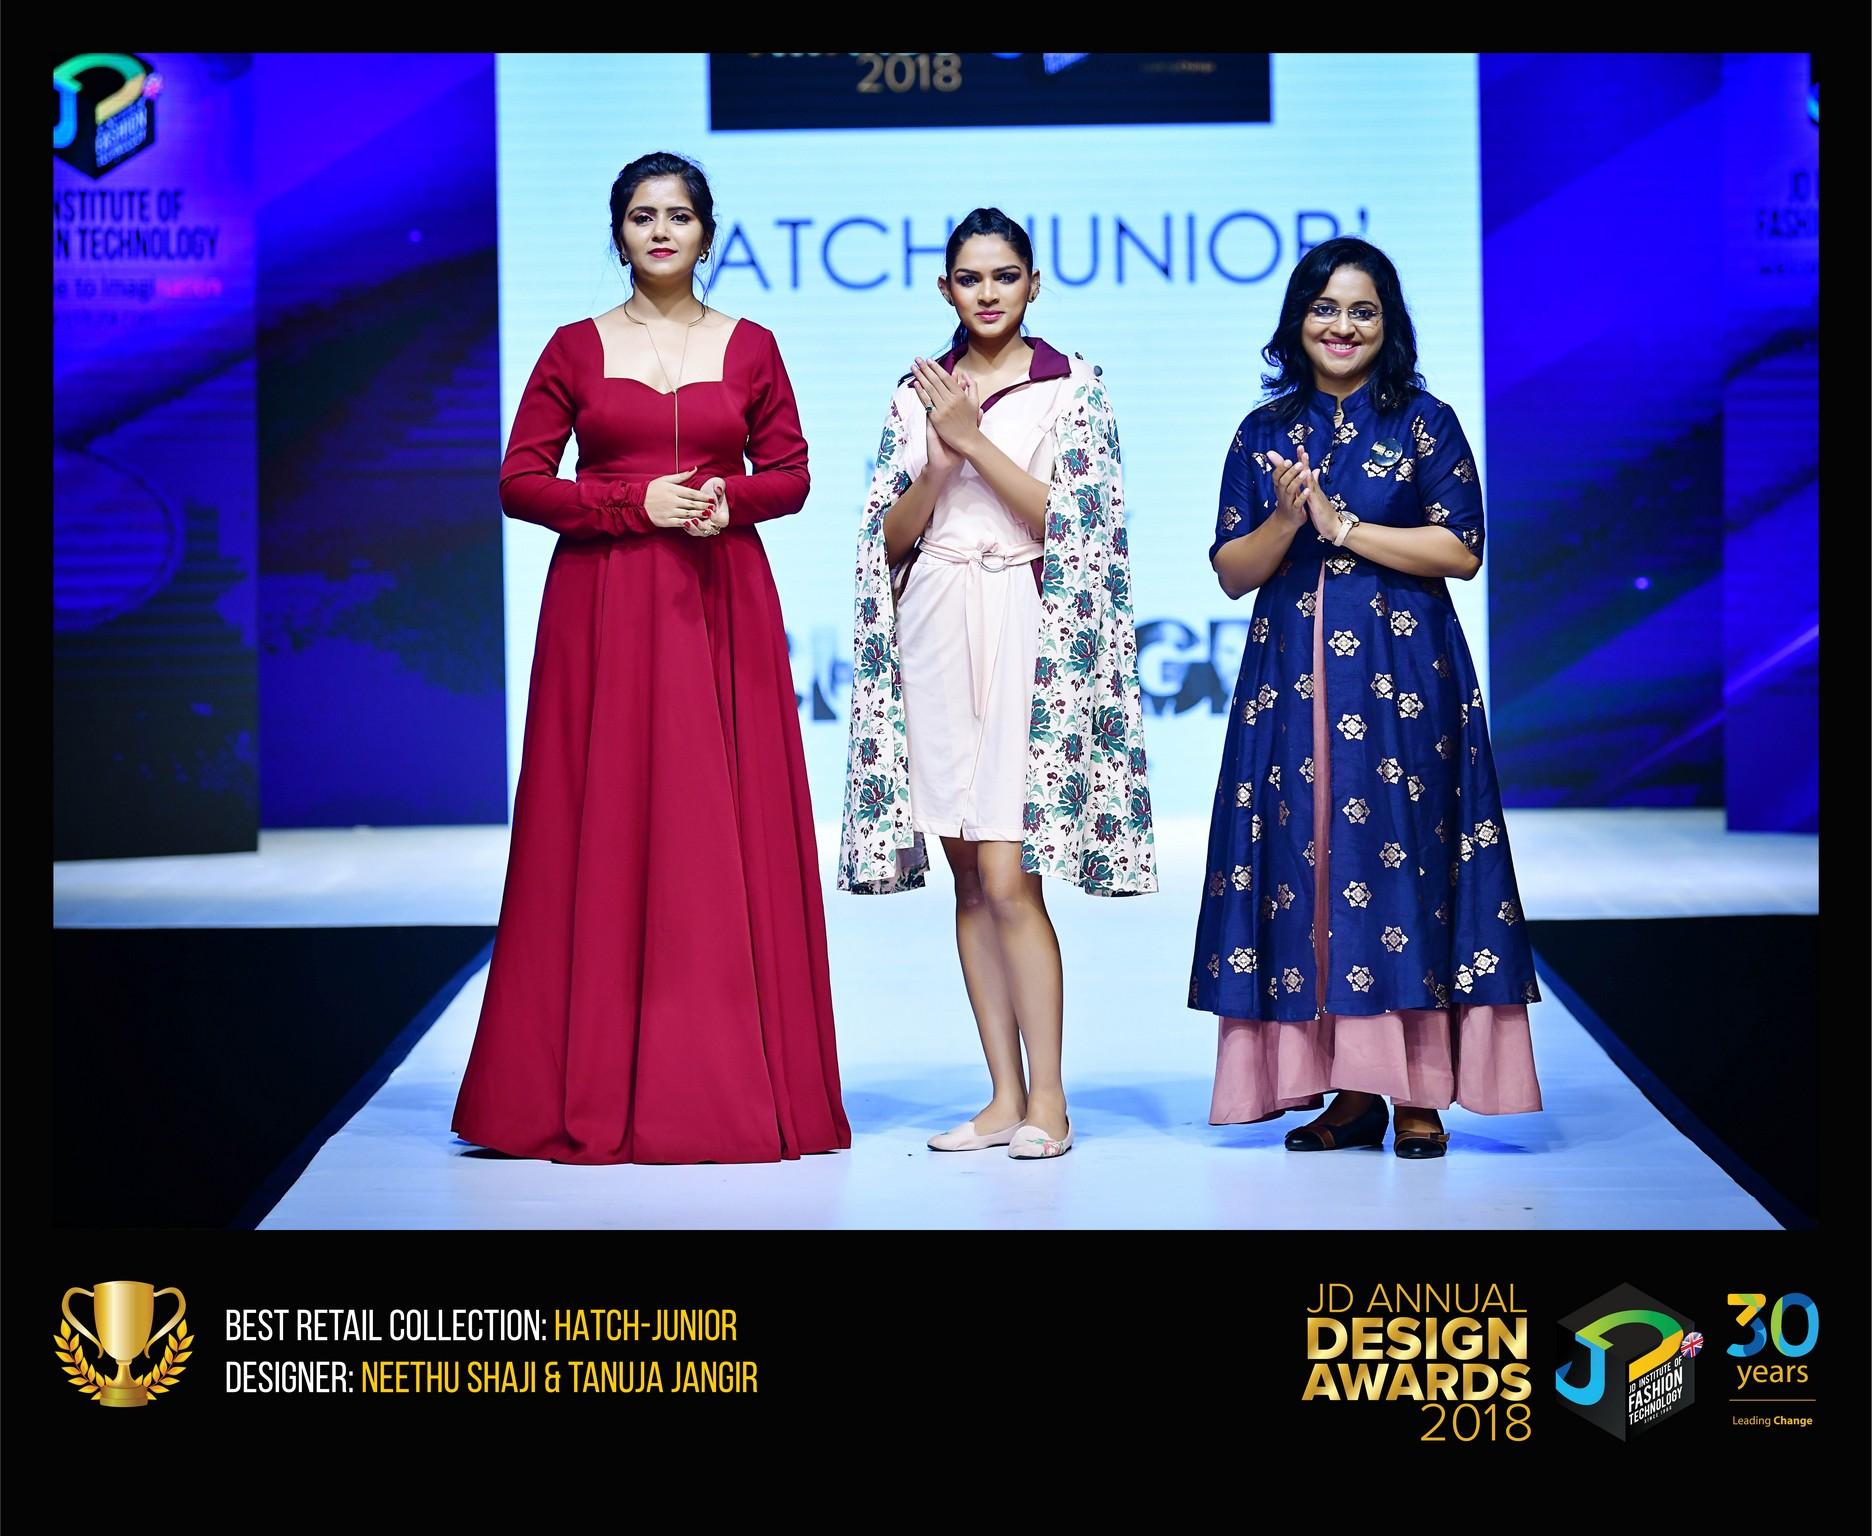 Hatch: Junior on Board – Change – JD Annual Design Awards 2018 | Designer: Neethu Shaji and Tanuja Jangir | Photography : Jerin Nath (@jerin_nath) hatch Hatch: Junior on Board – Change – JD Annual Design Awards 2018 HATCH JUNIOR7